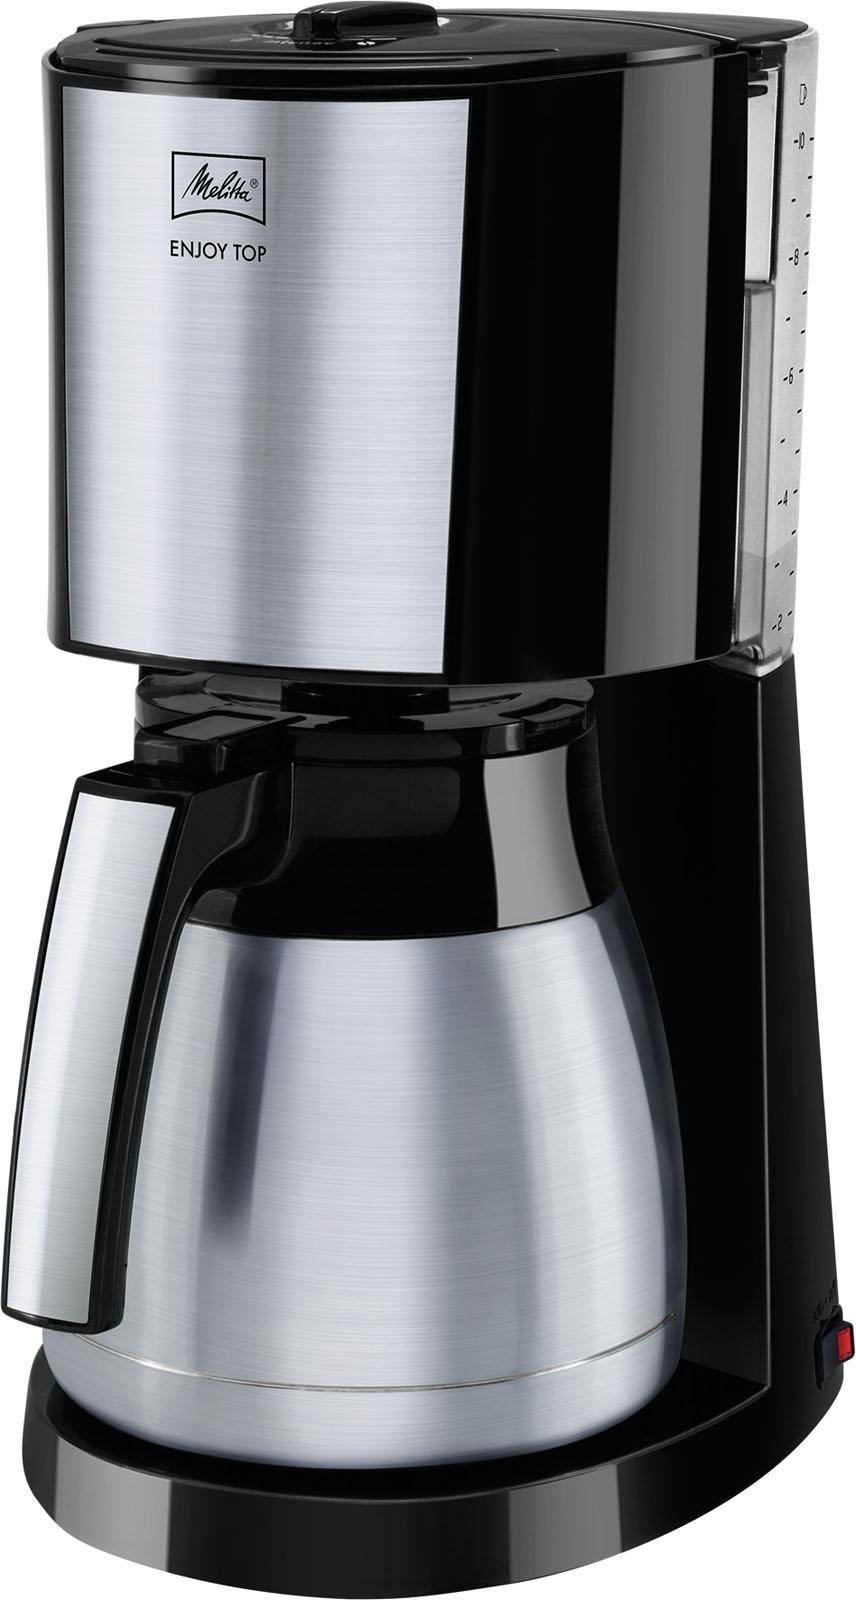 Melitta koffiezetapparaat Enjoy Top Therm (Zwart)